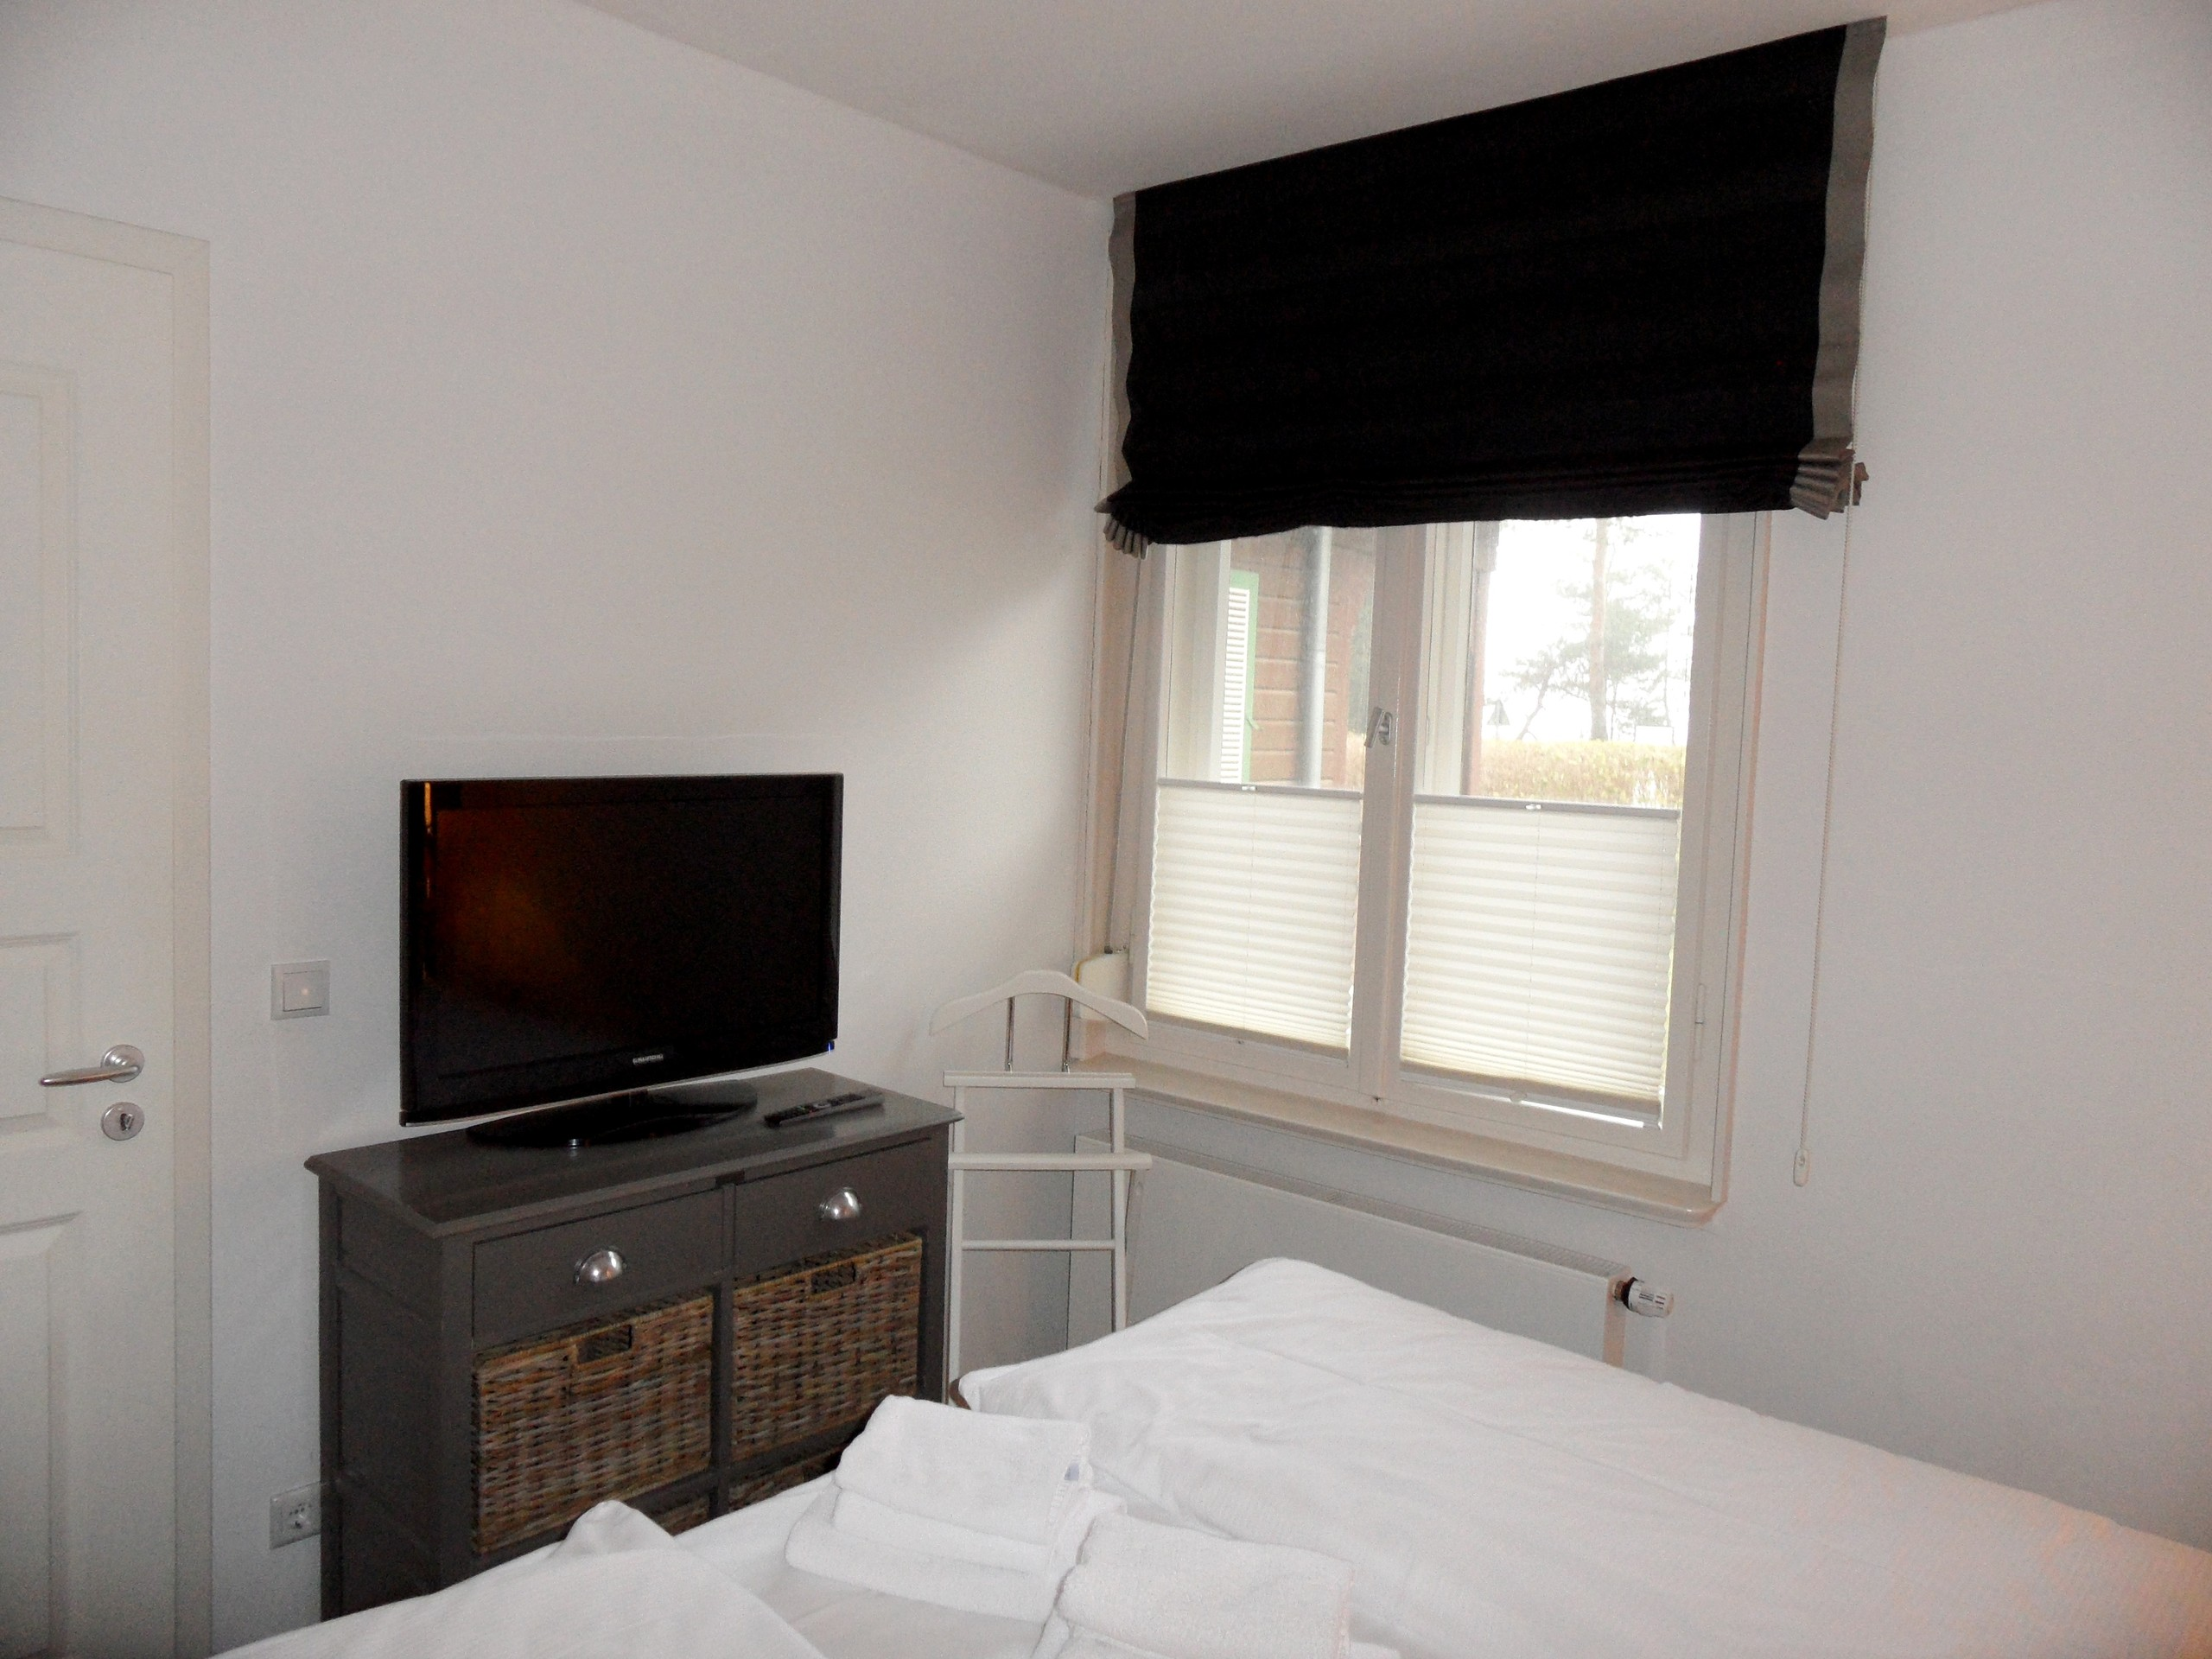 2. Schlafzimmer inkl. TV